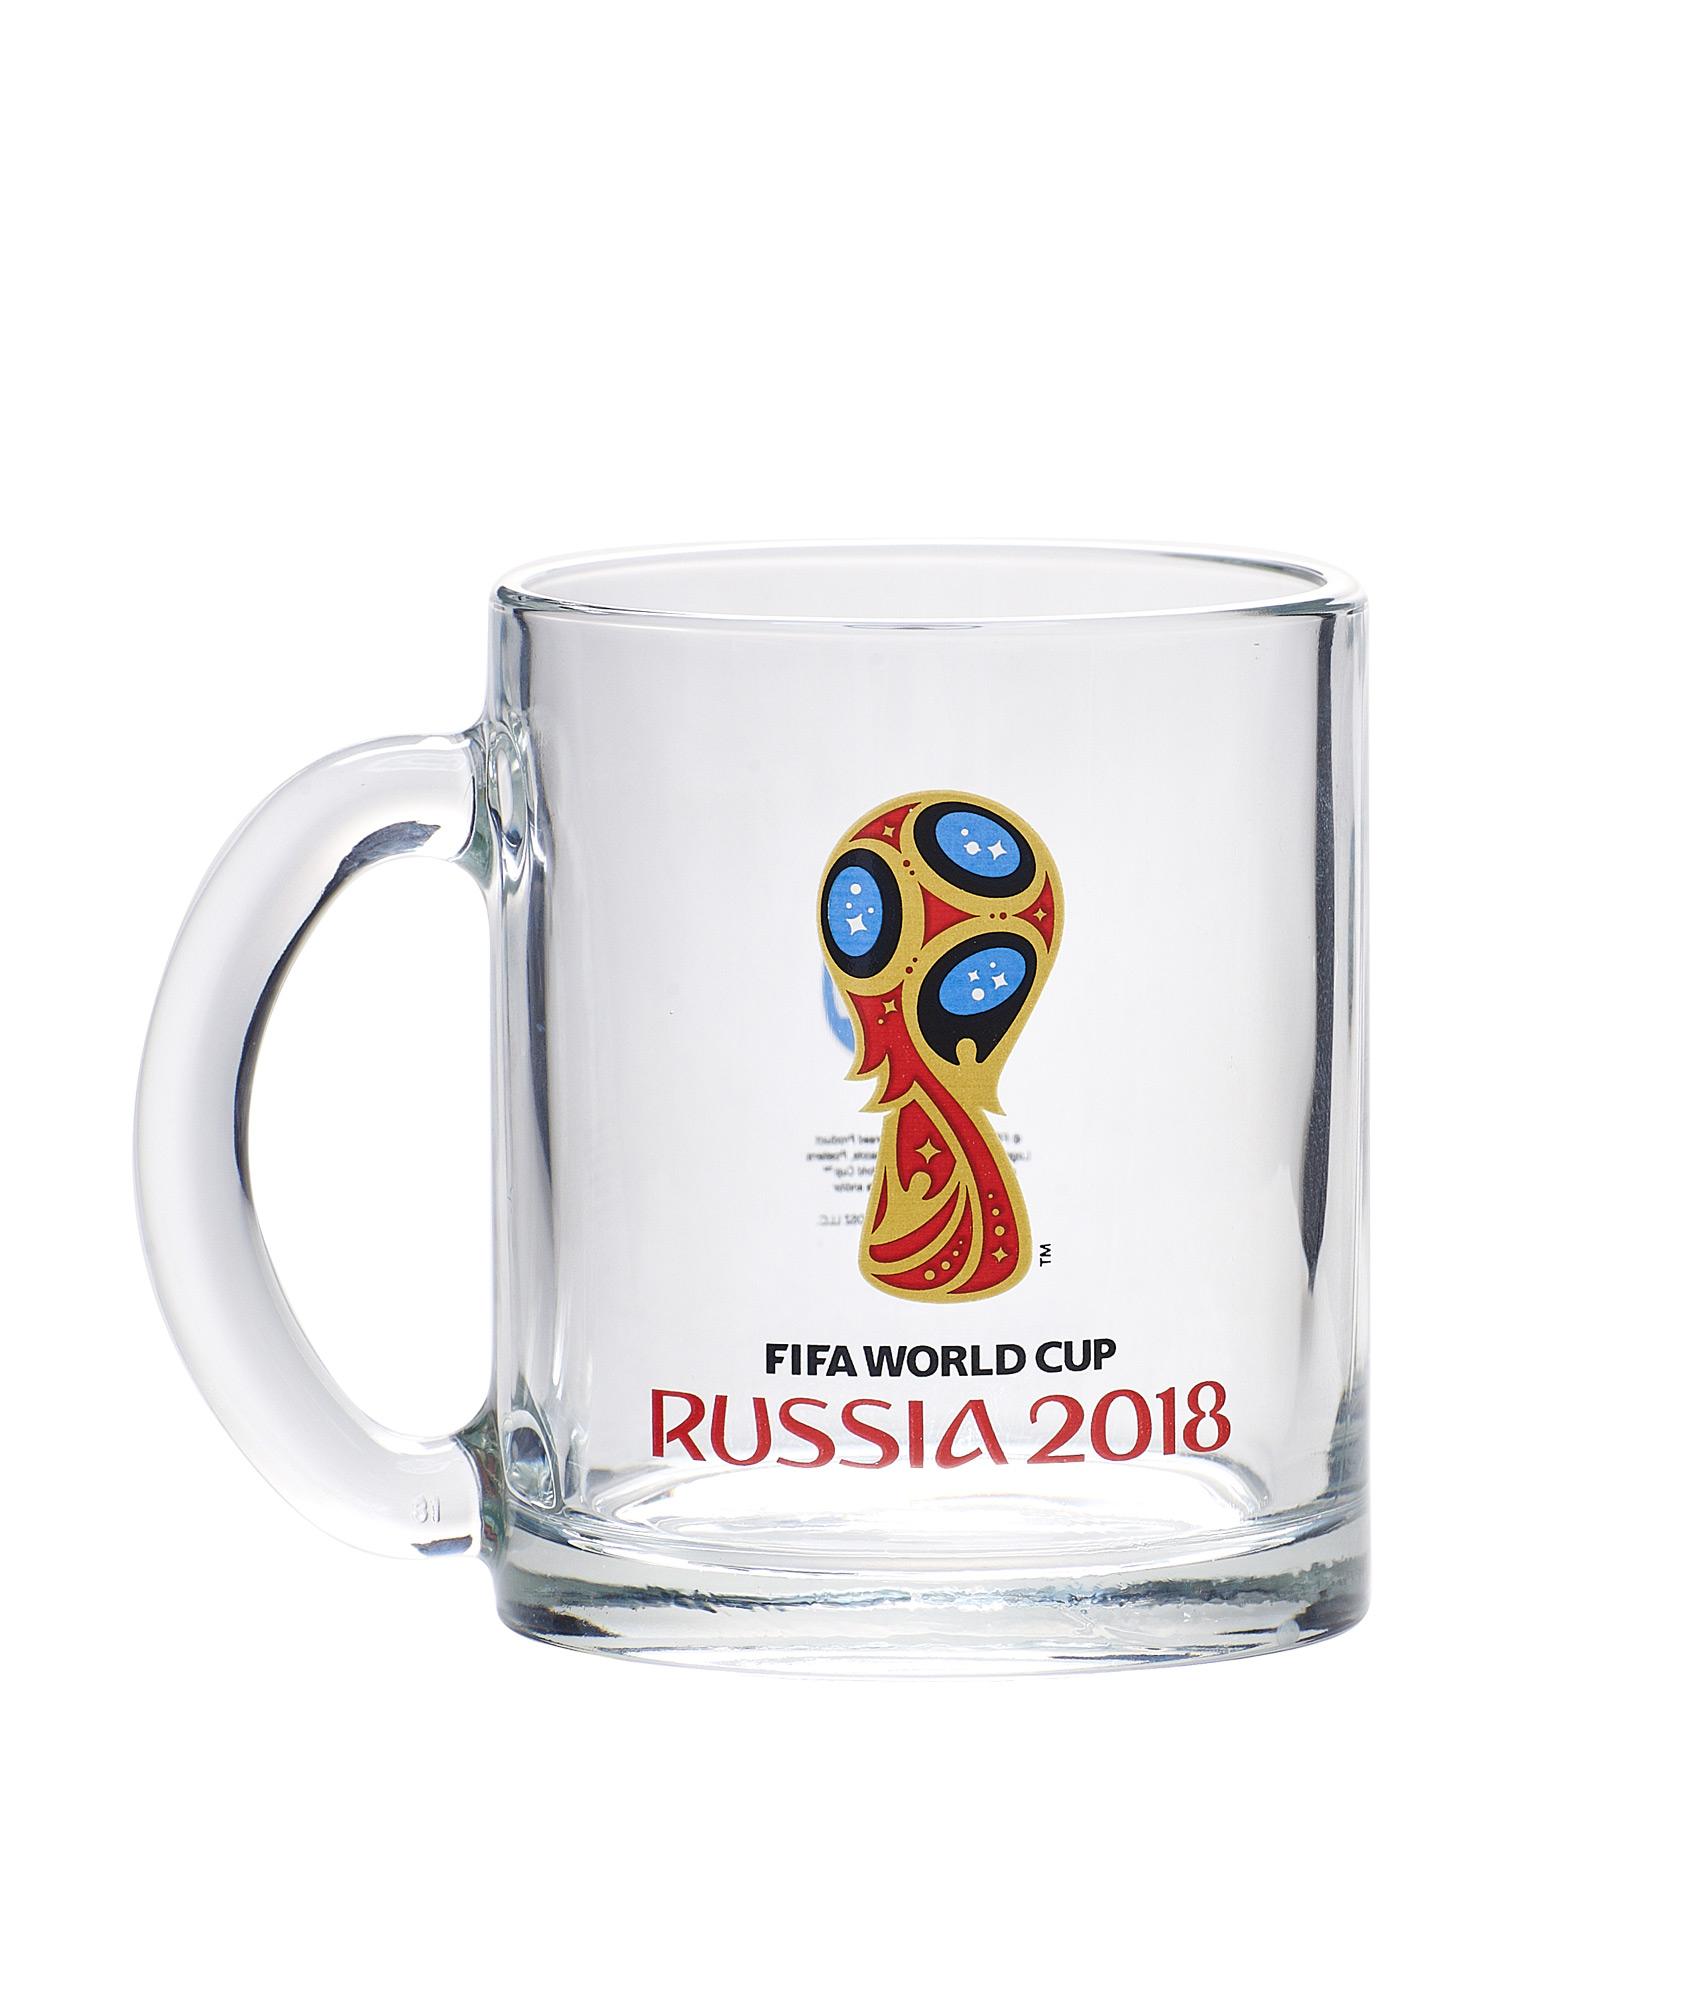 Кружка «Эмблема» Зенит значок закатной эмблема чемпионата мира 2018 зенит